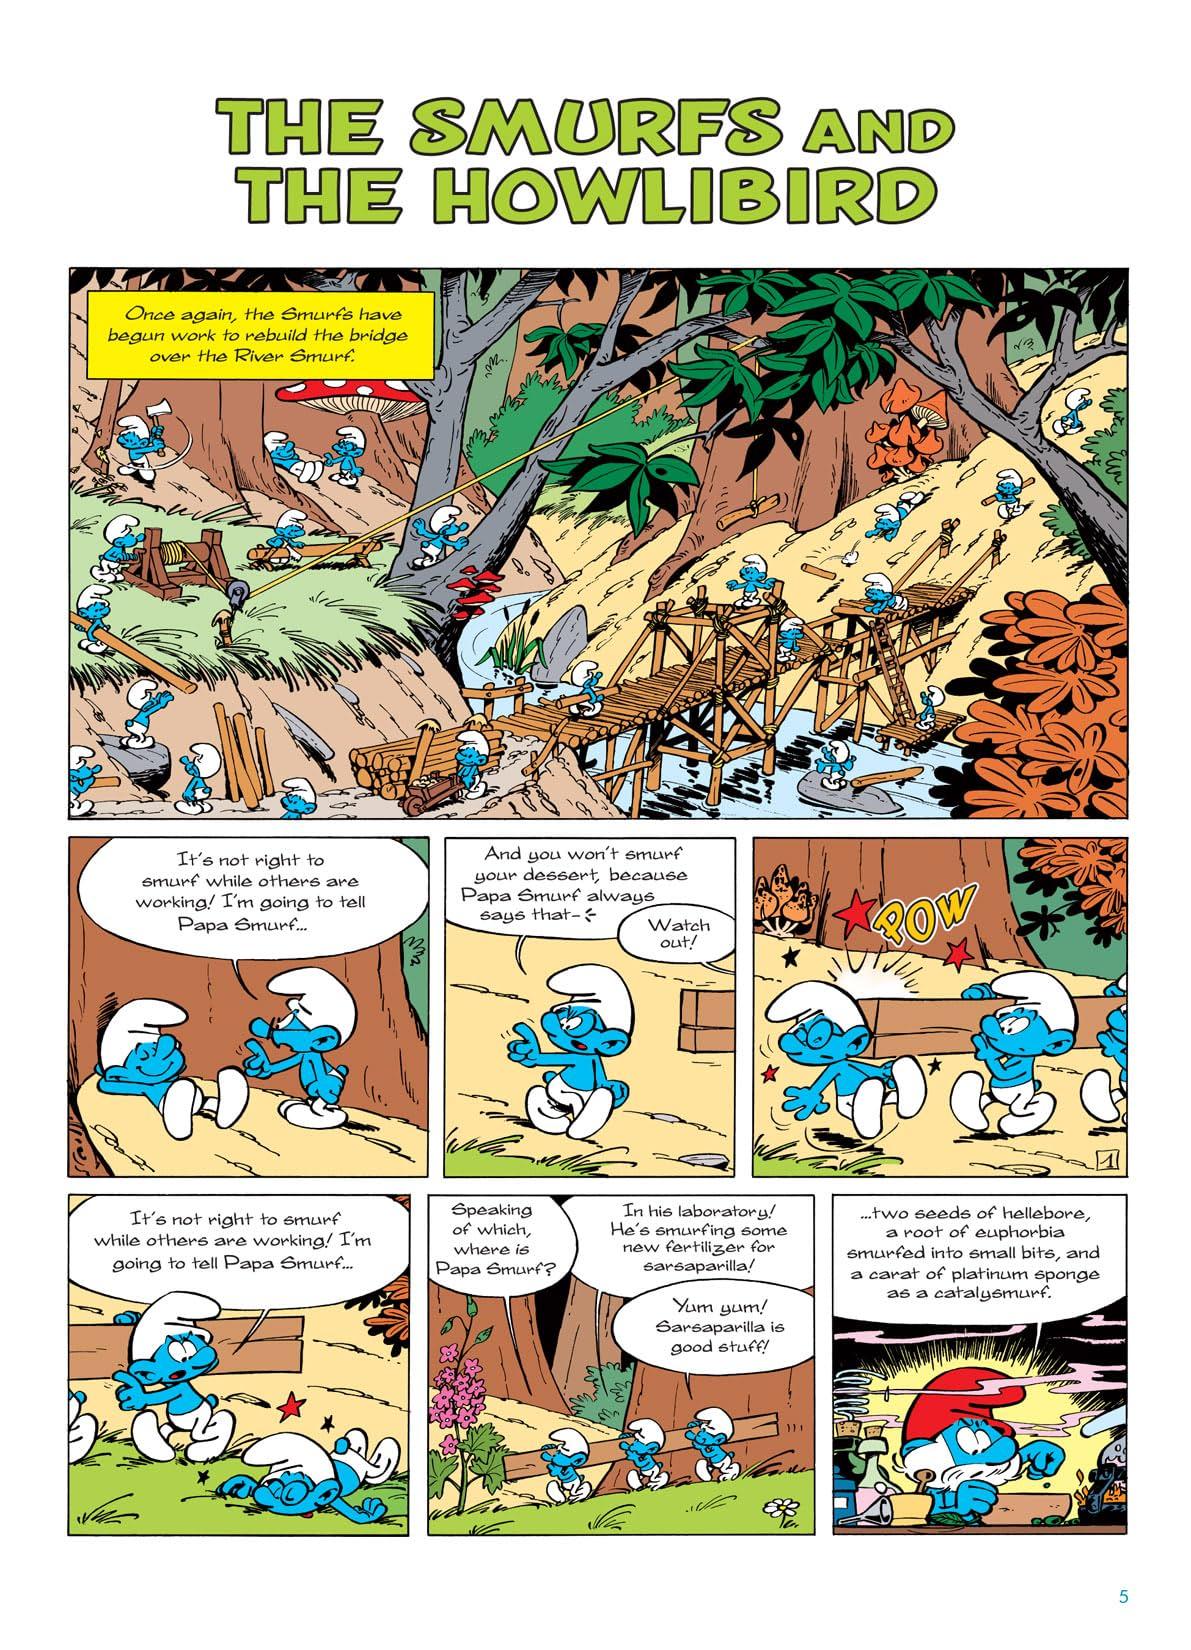 The Smurfs Vol. 6: The Smurfs and the Howlibird